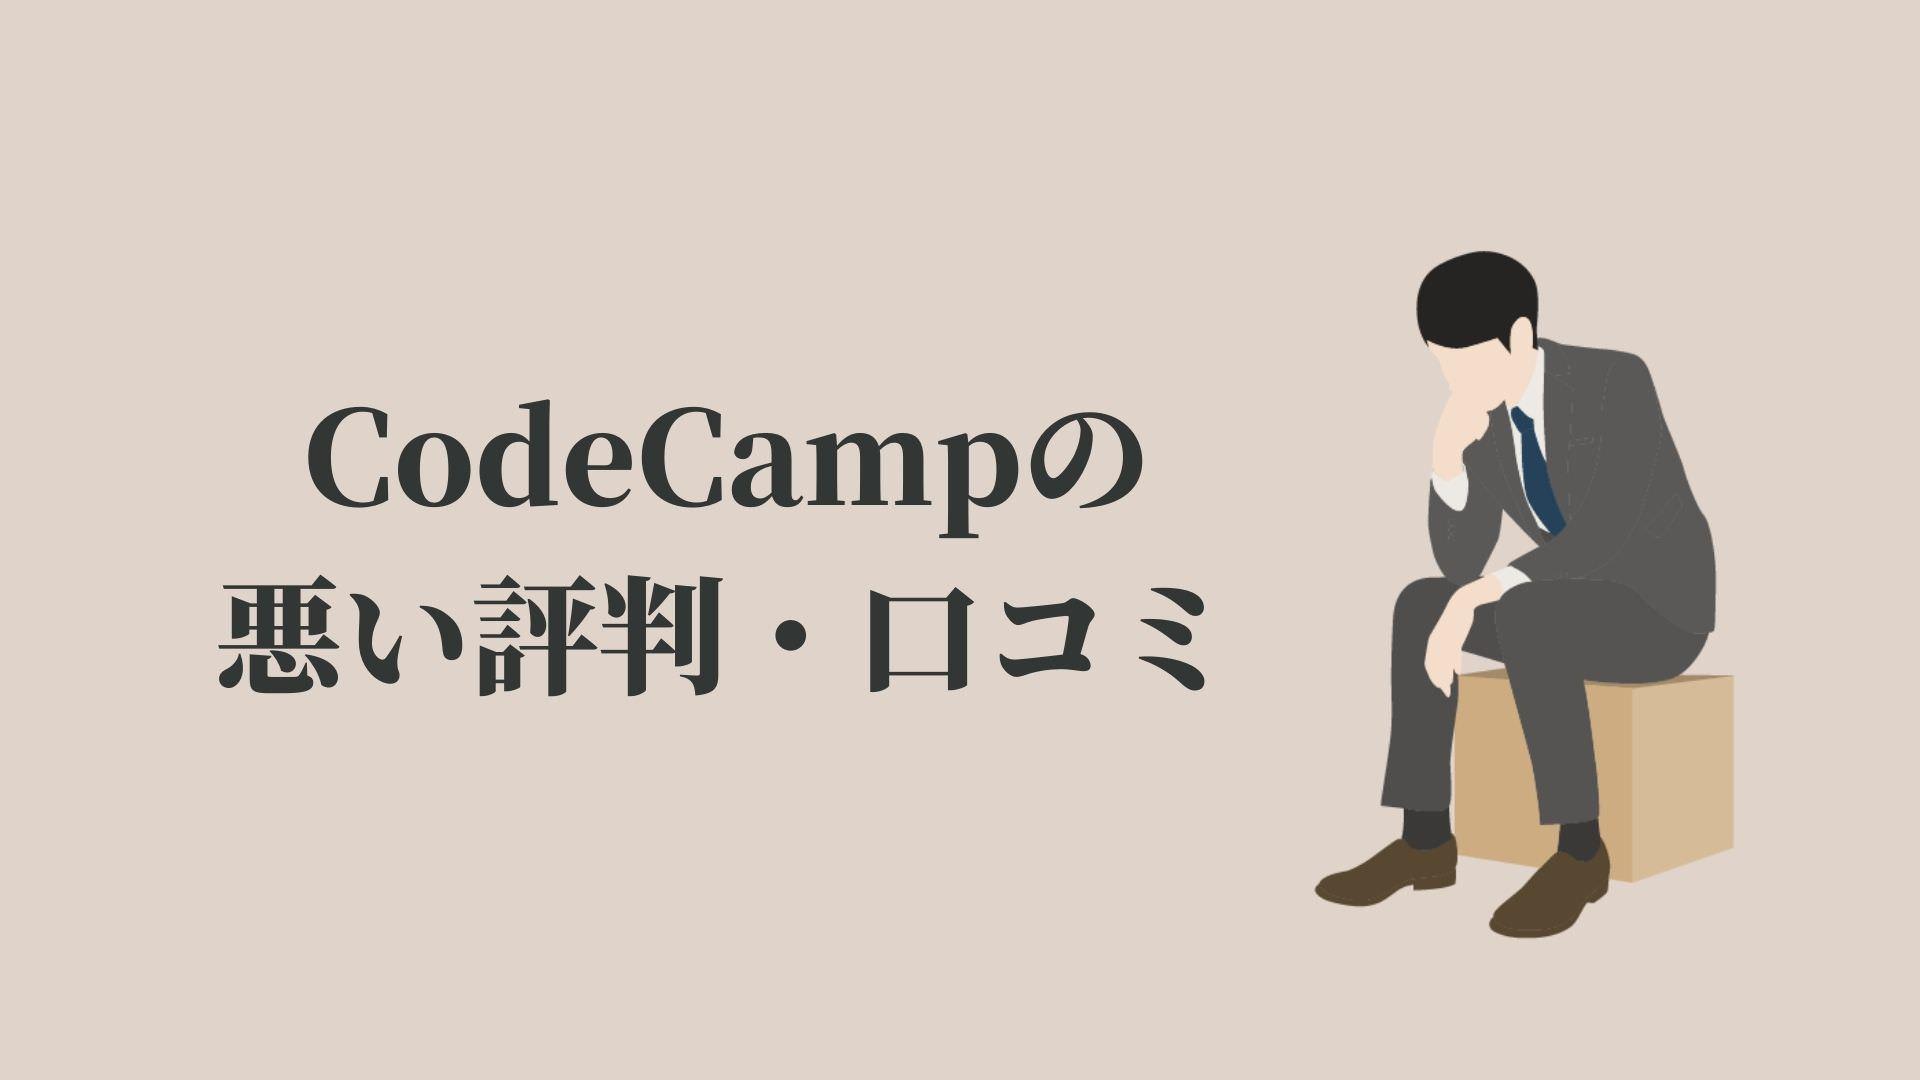 CodeCamp(コードキャンプ)の悪い評判・口コミ